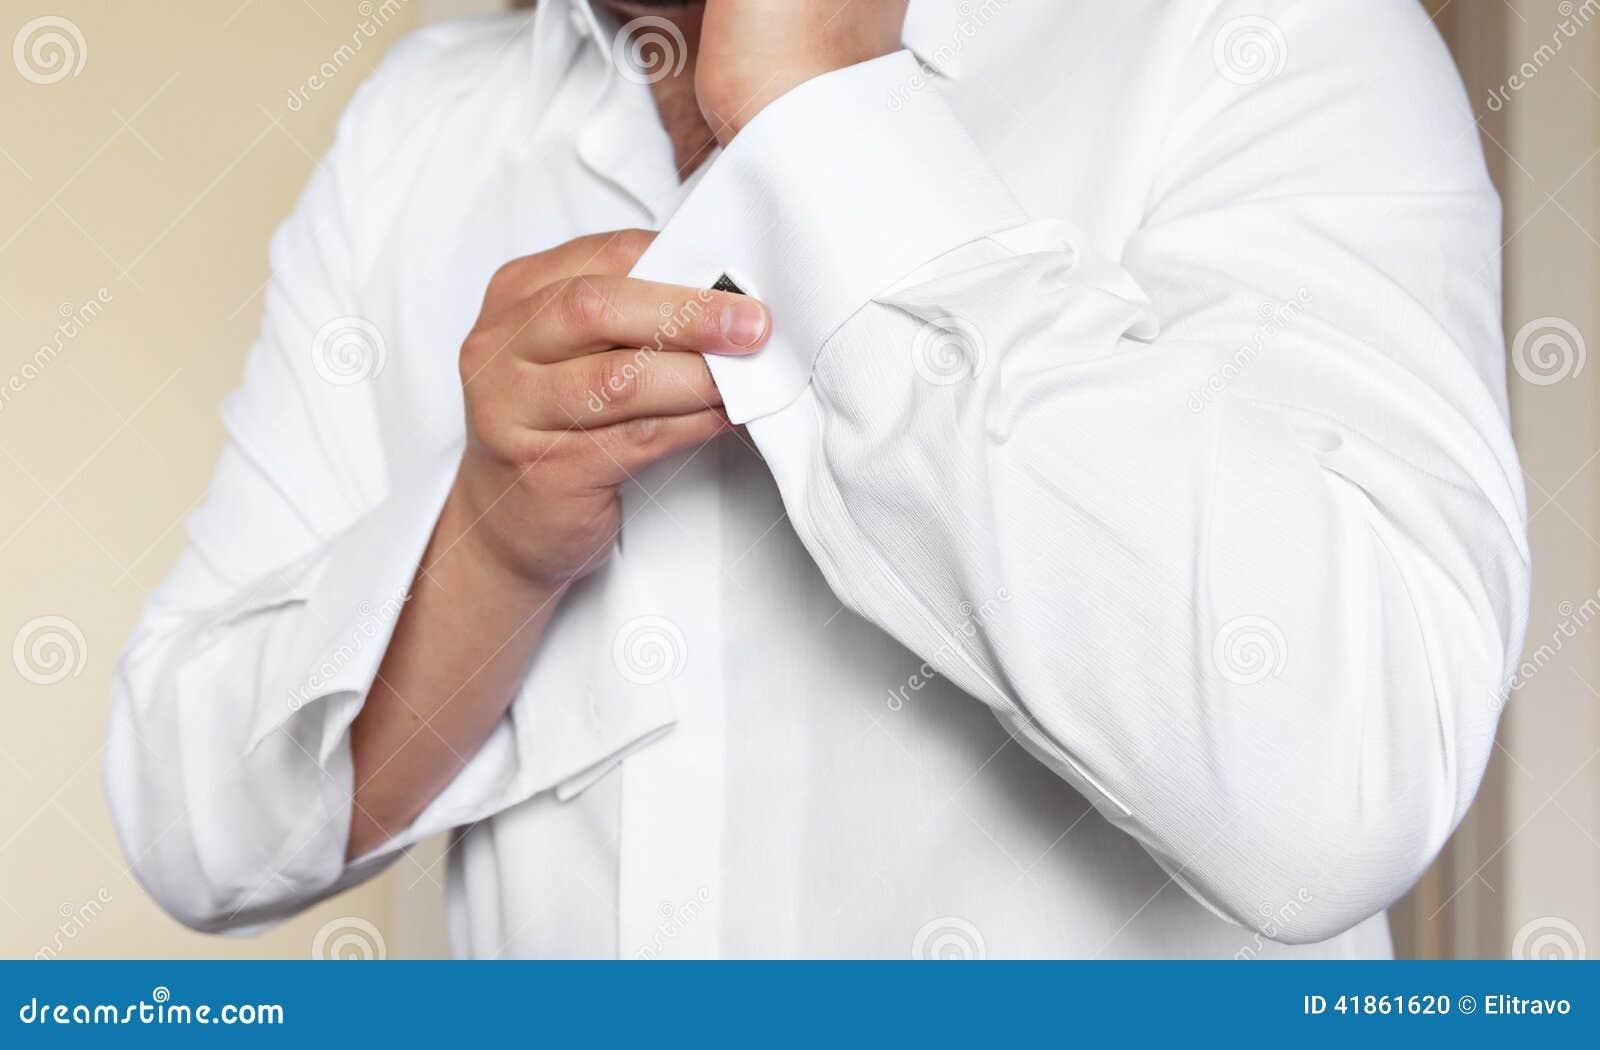 White shirt for cufflinks artee shirt for Mens white cufflink shirts